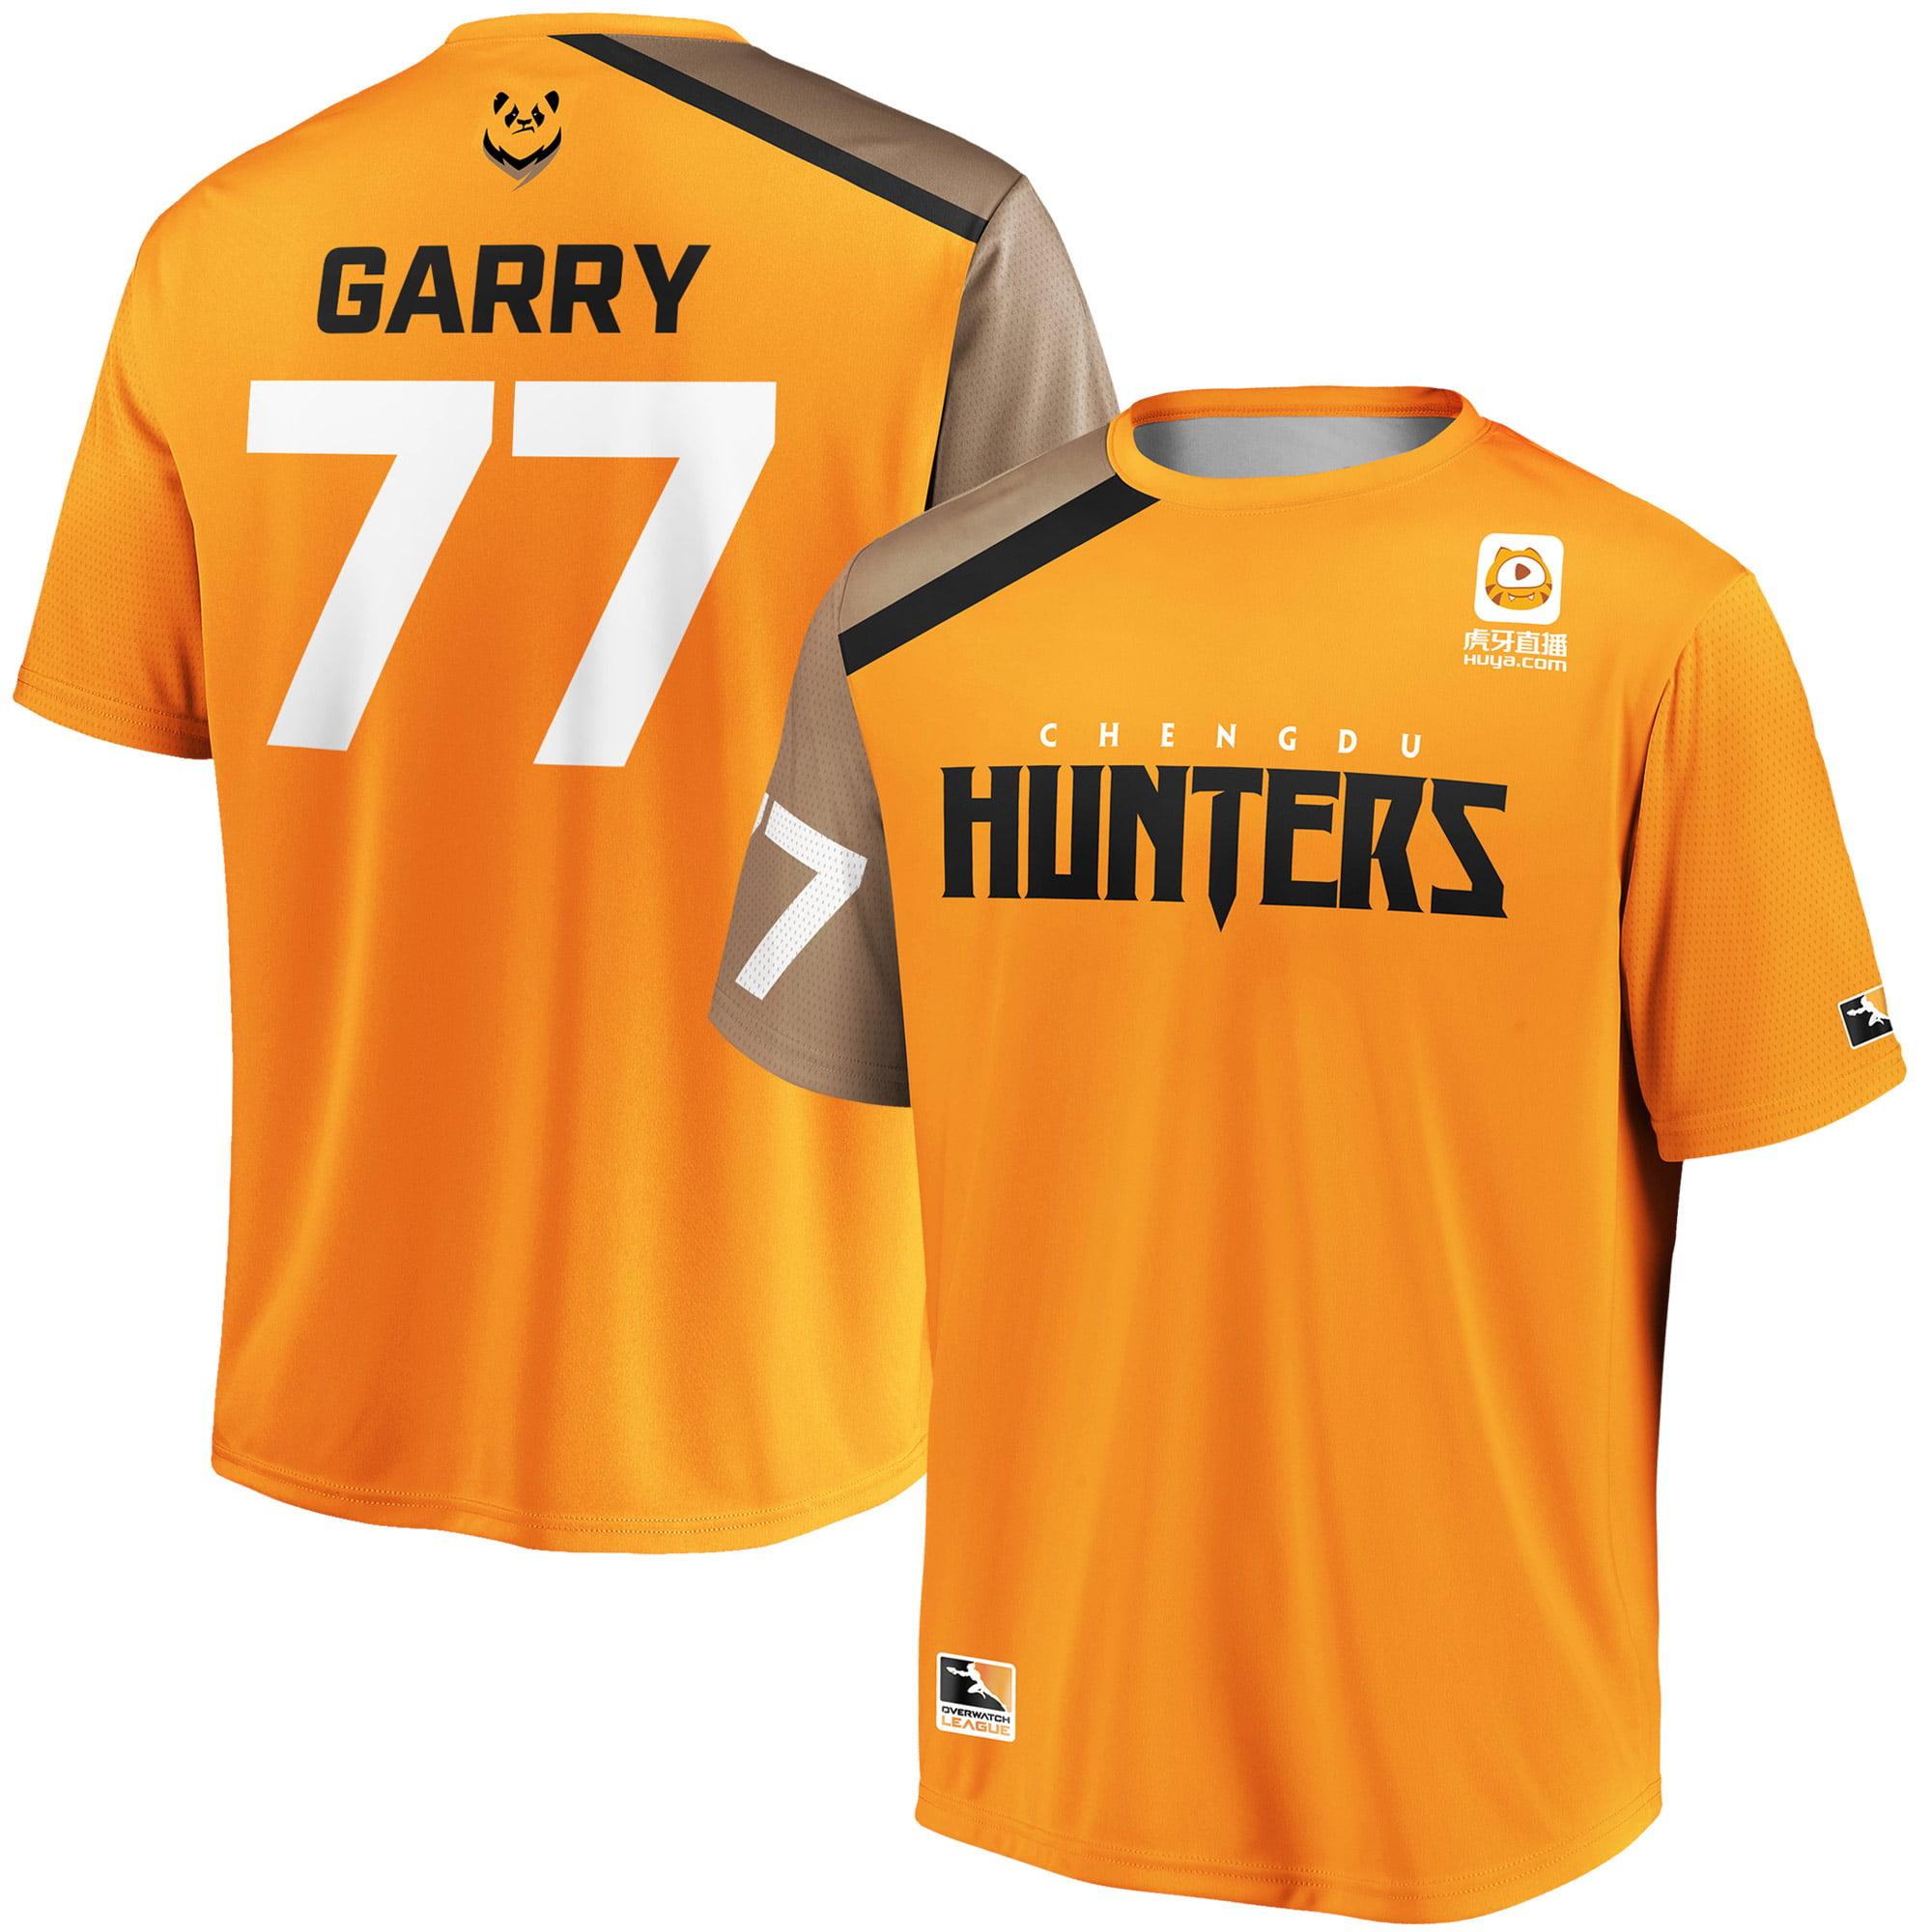 Garry Chengdu Hunters Overwatch League Replica Home Jersey - Orange